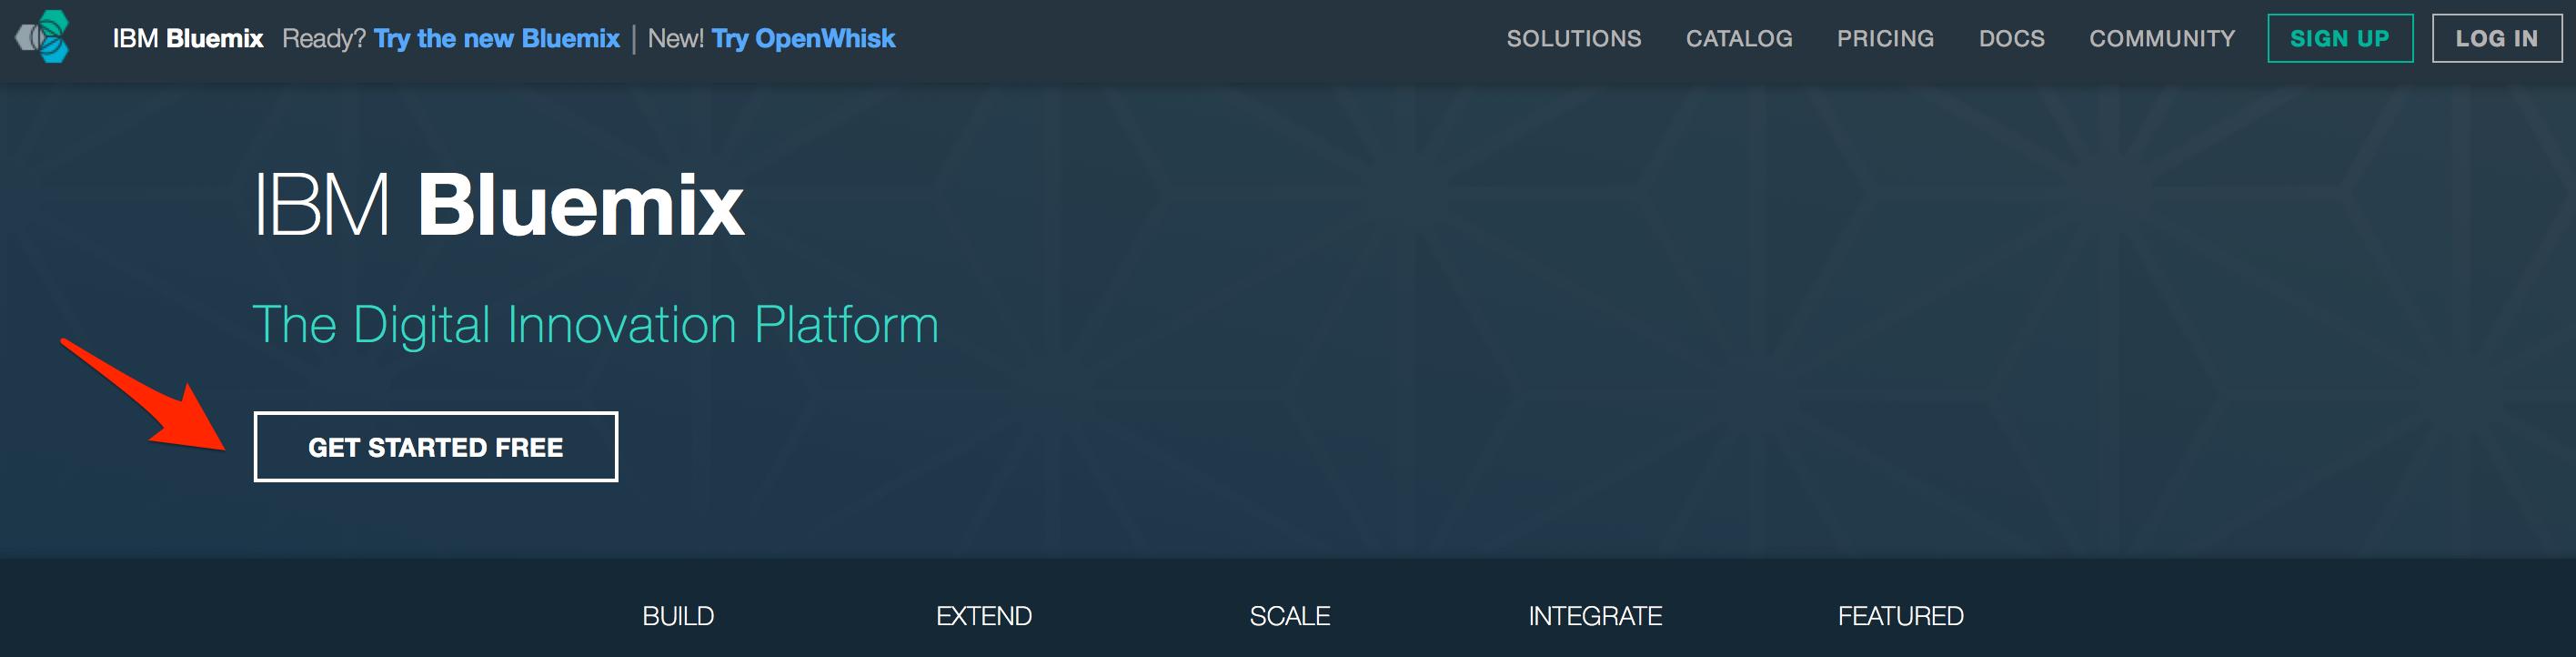 bluemix-home-page